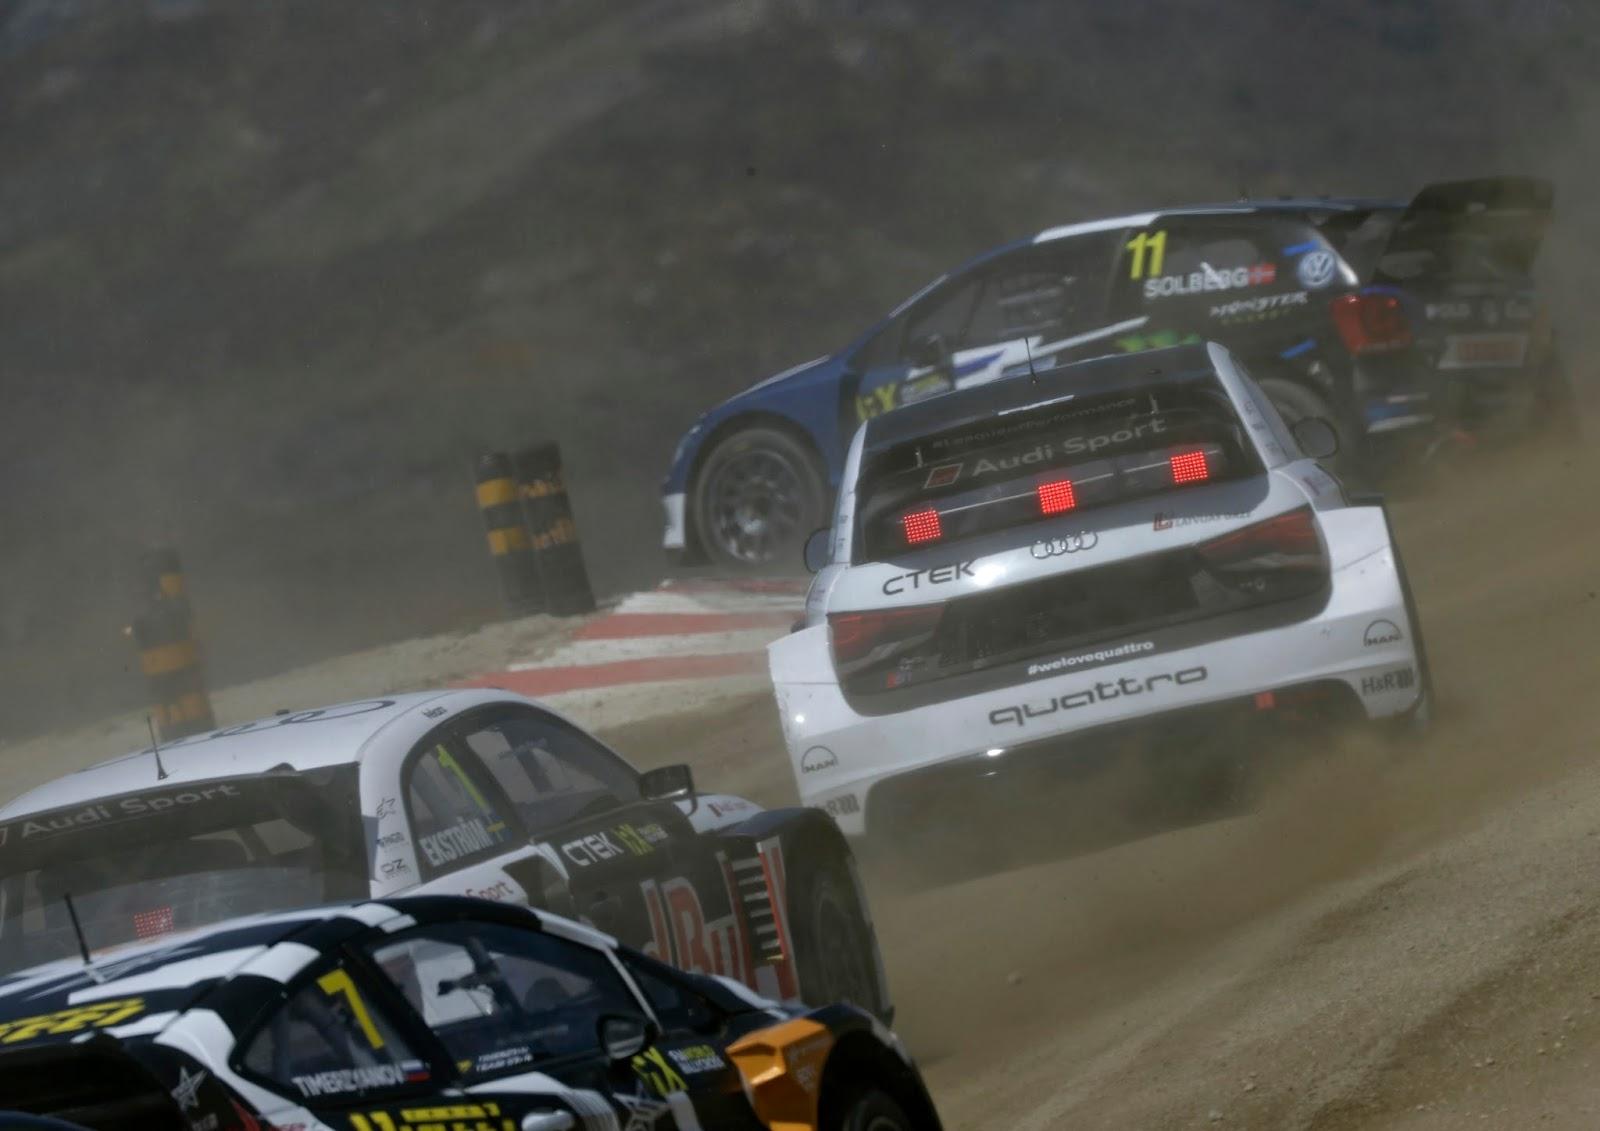 A173401 large Δες όλο τον αγώνα του συναρπαστικού Rallycross FIA, FIA World Rallycross Championship, Rally, videos, World RX